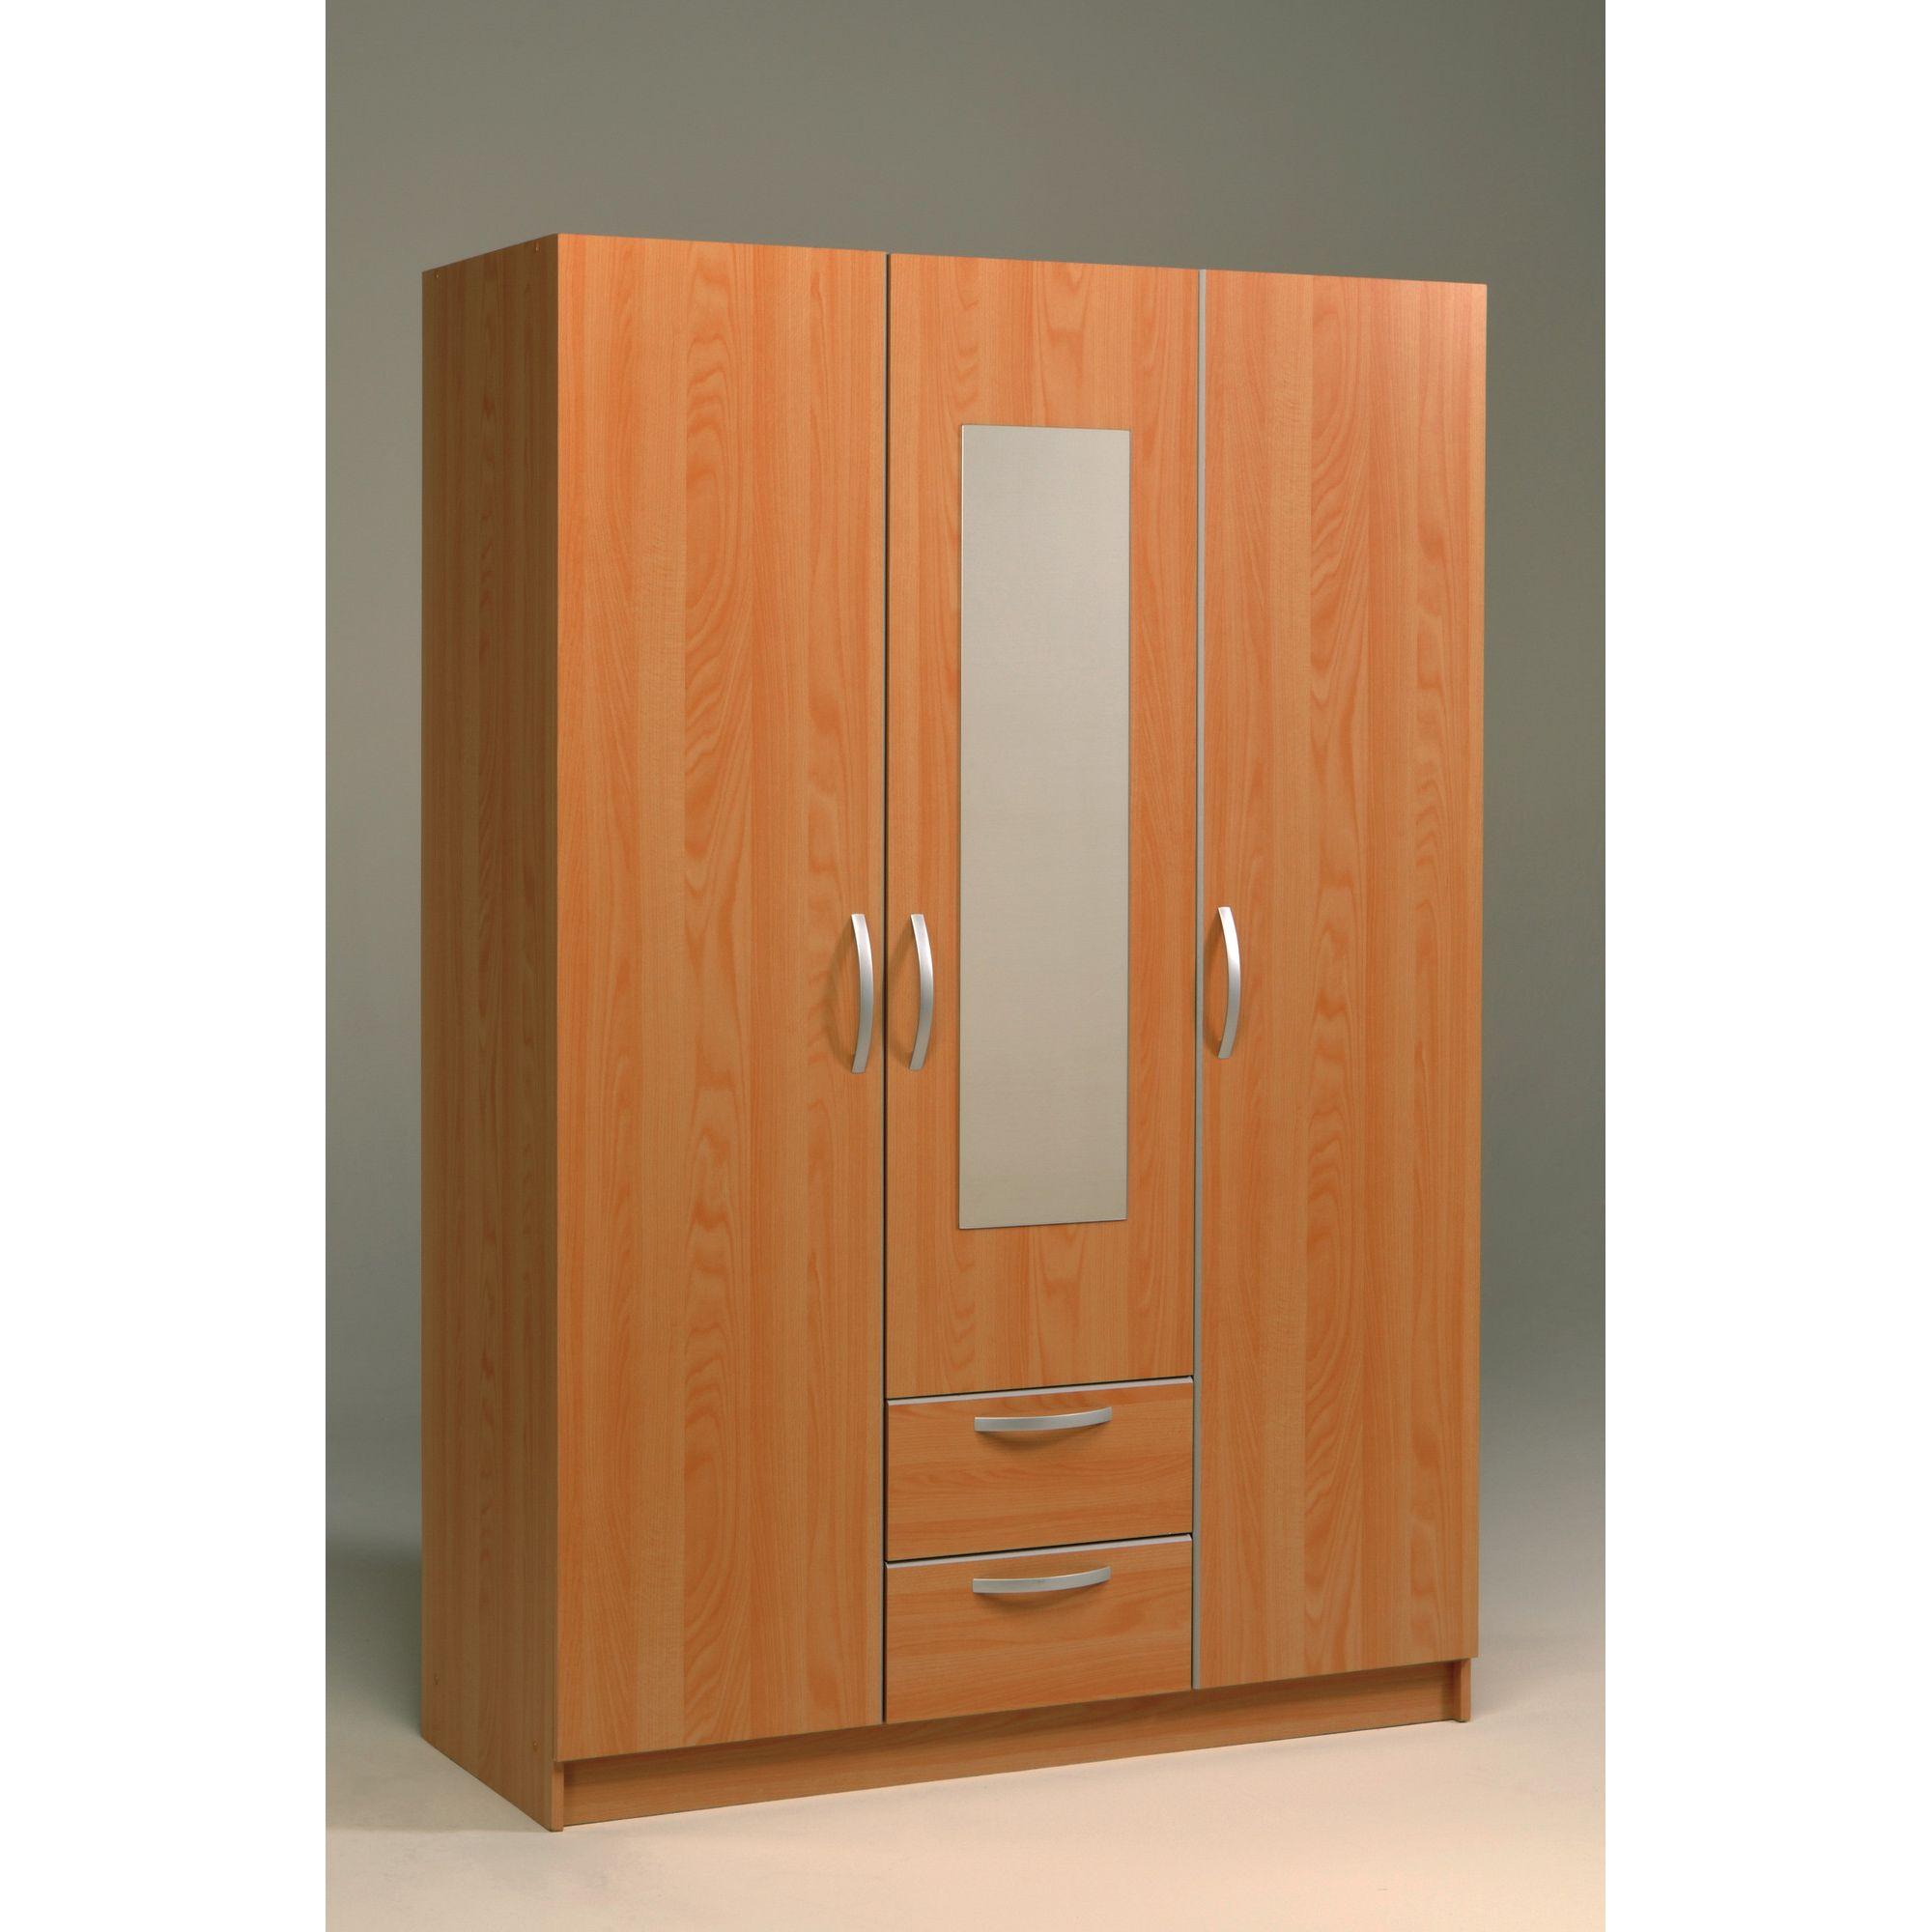 Parisot Soluce Three Door Wardrobe in Japan Pear Tree / Grey Silver at Tesco Direct